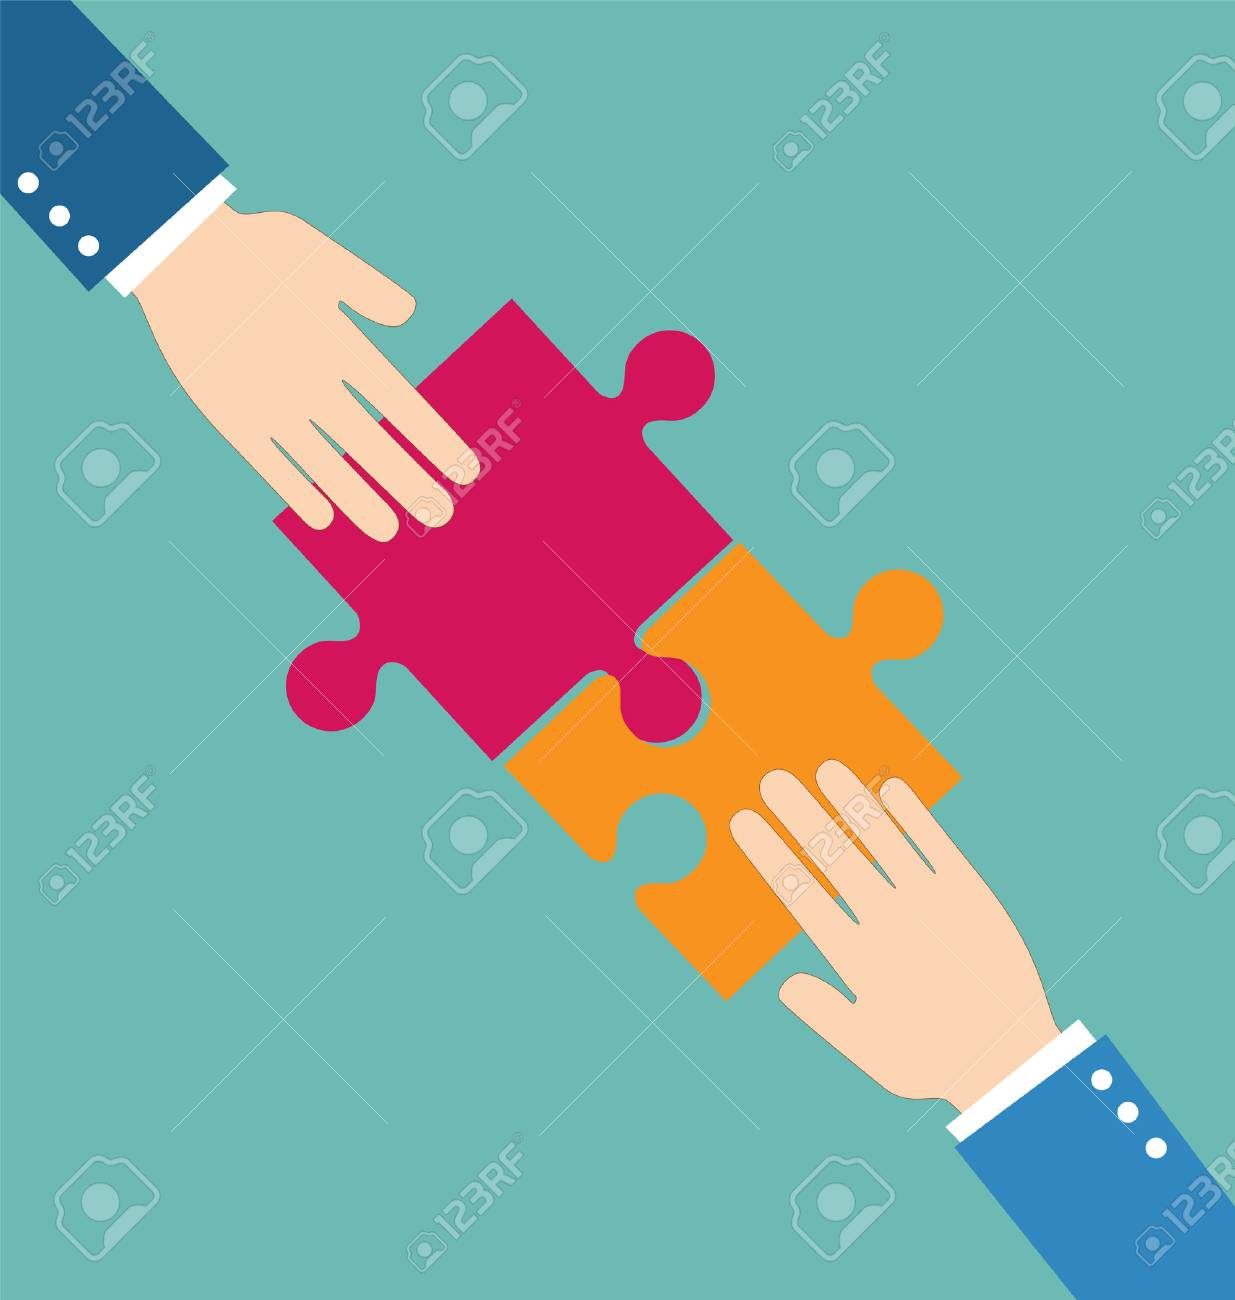 Teamwork concept, Businessman put pieces of puzzle together - 55081417